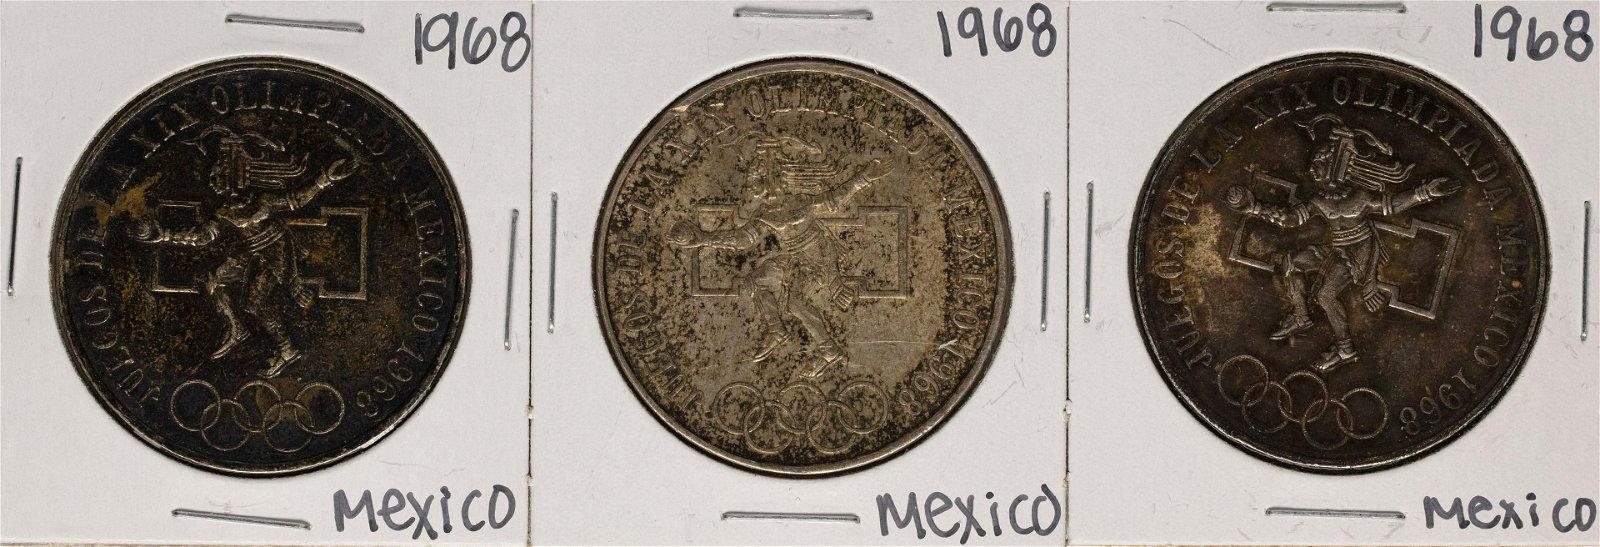 Lot of (3) 1968 Mexico 25 Pesos Olympics Commemorative